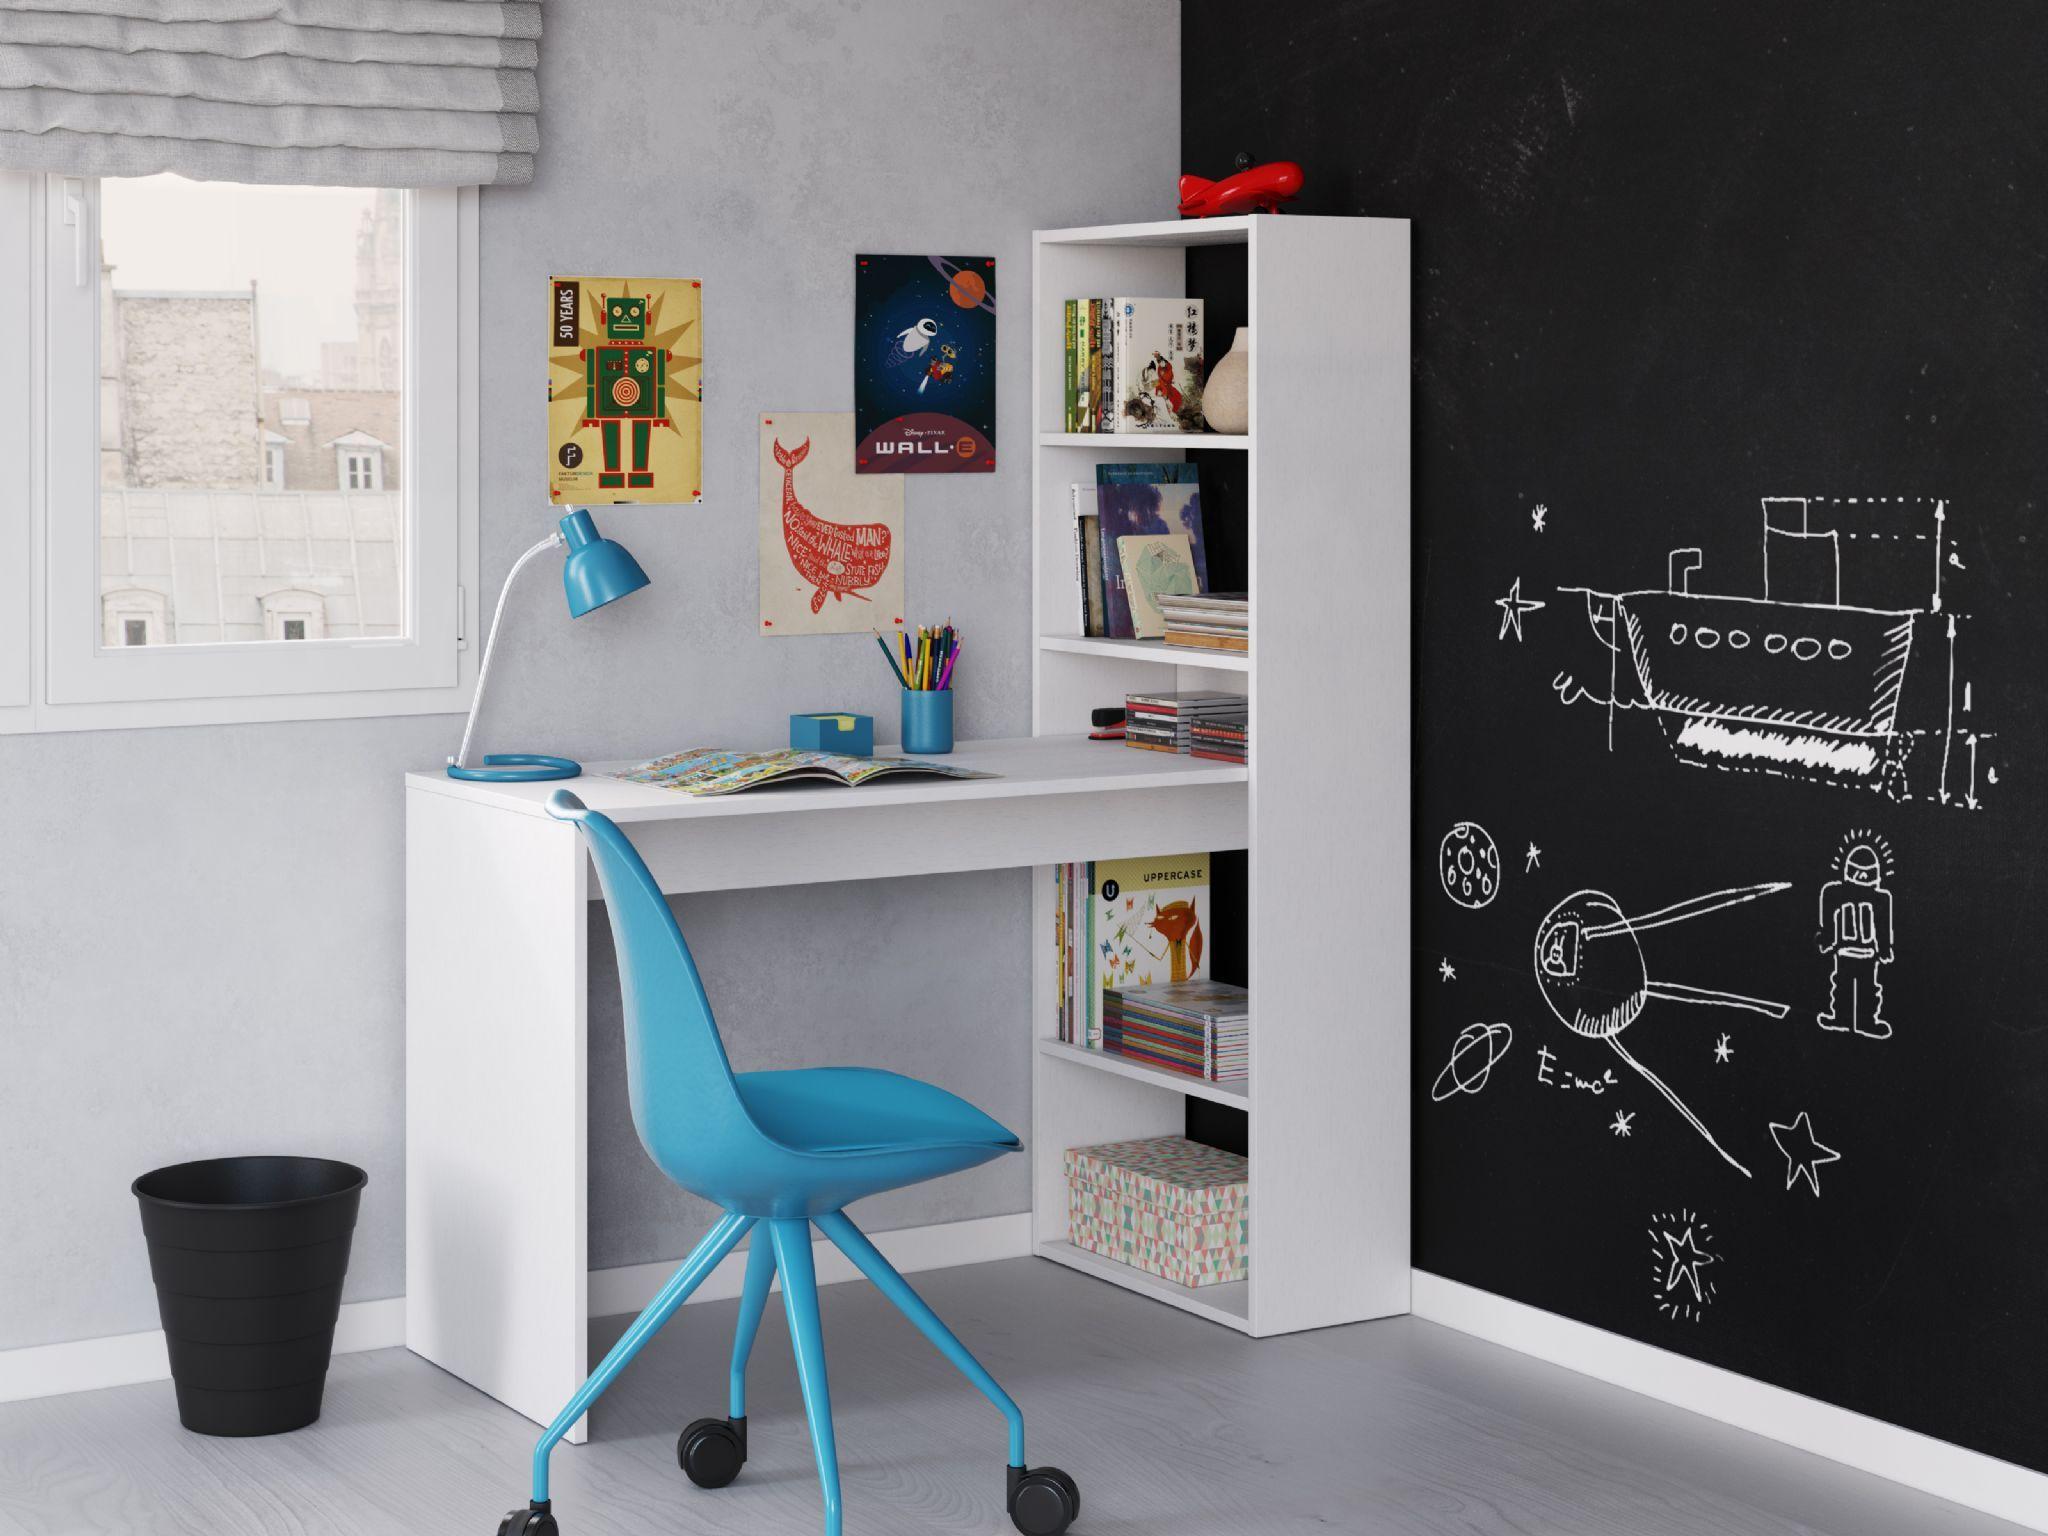 Amalfi White bo puter Desk Table with Bookshelf 2564 in 2018